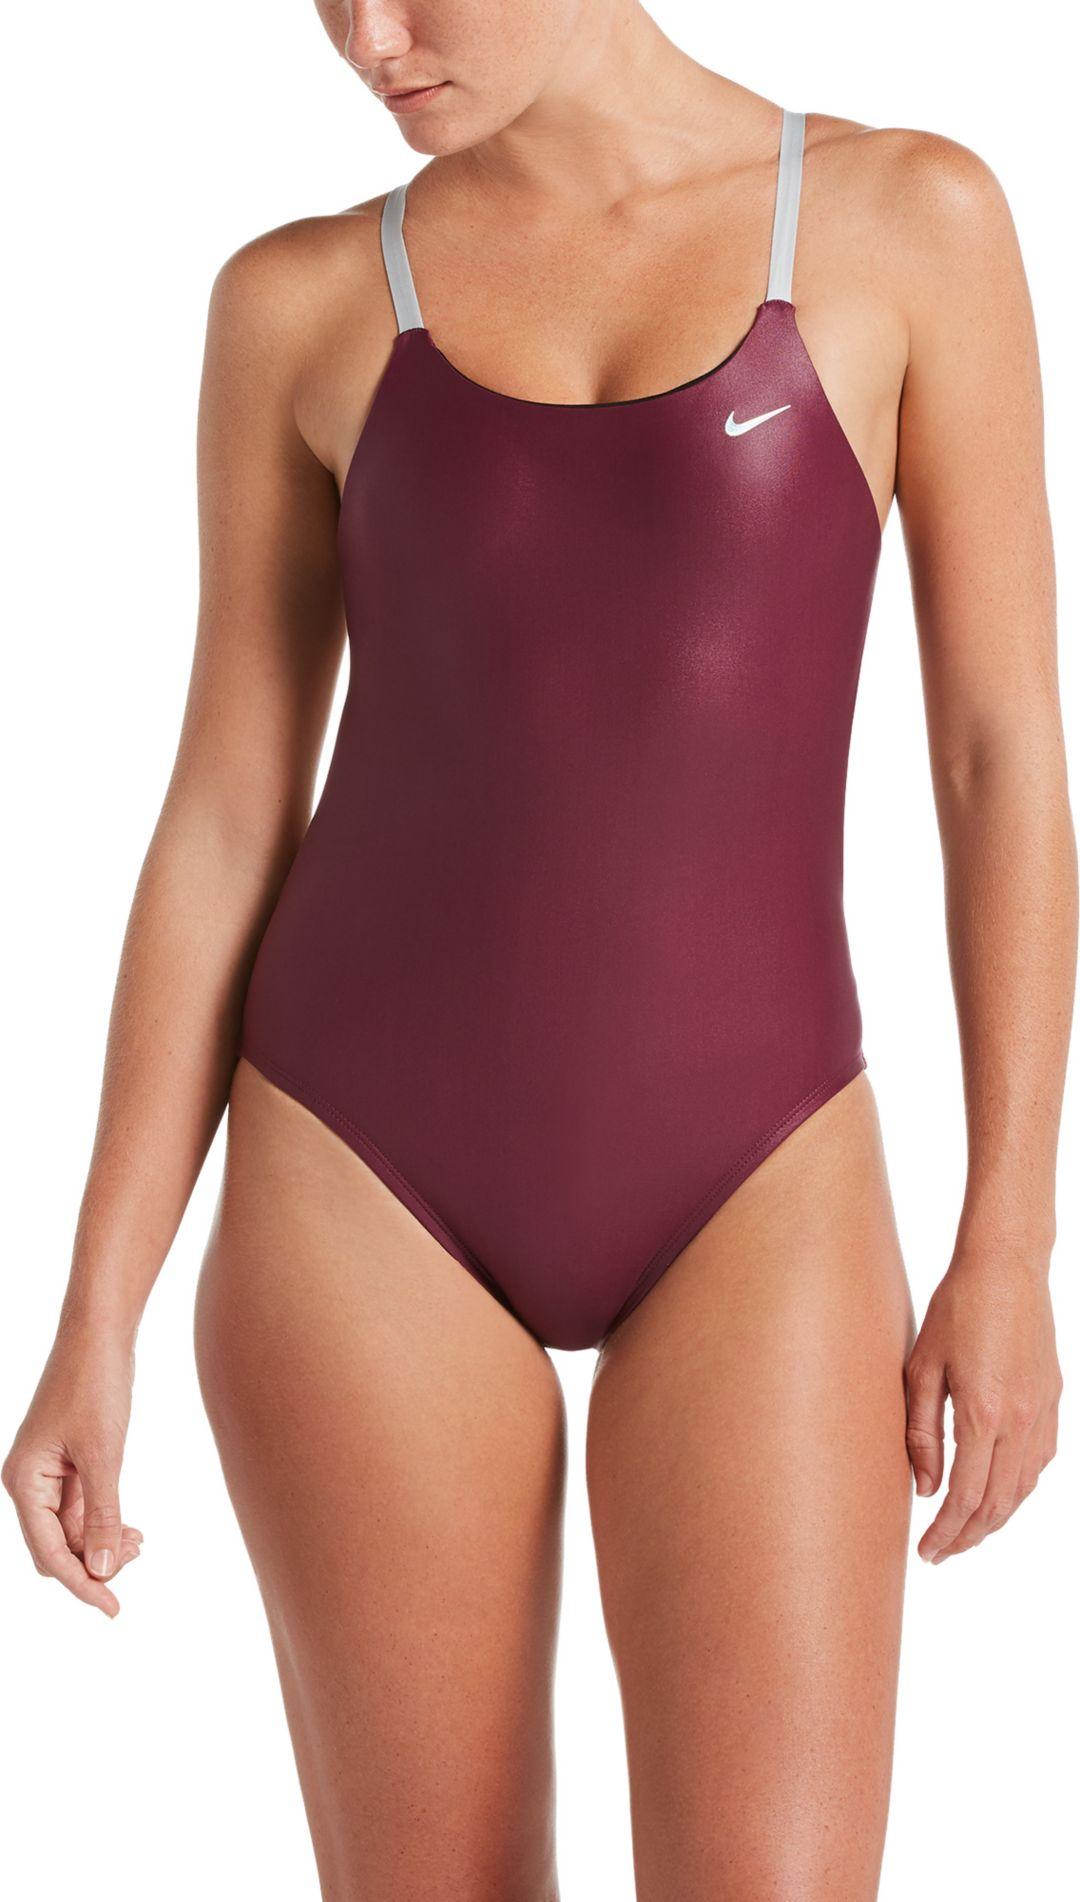 40177da57b4ea Nike Women's Flash Bonded Cut-Out One Piece Swimsuit